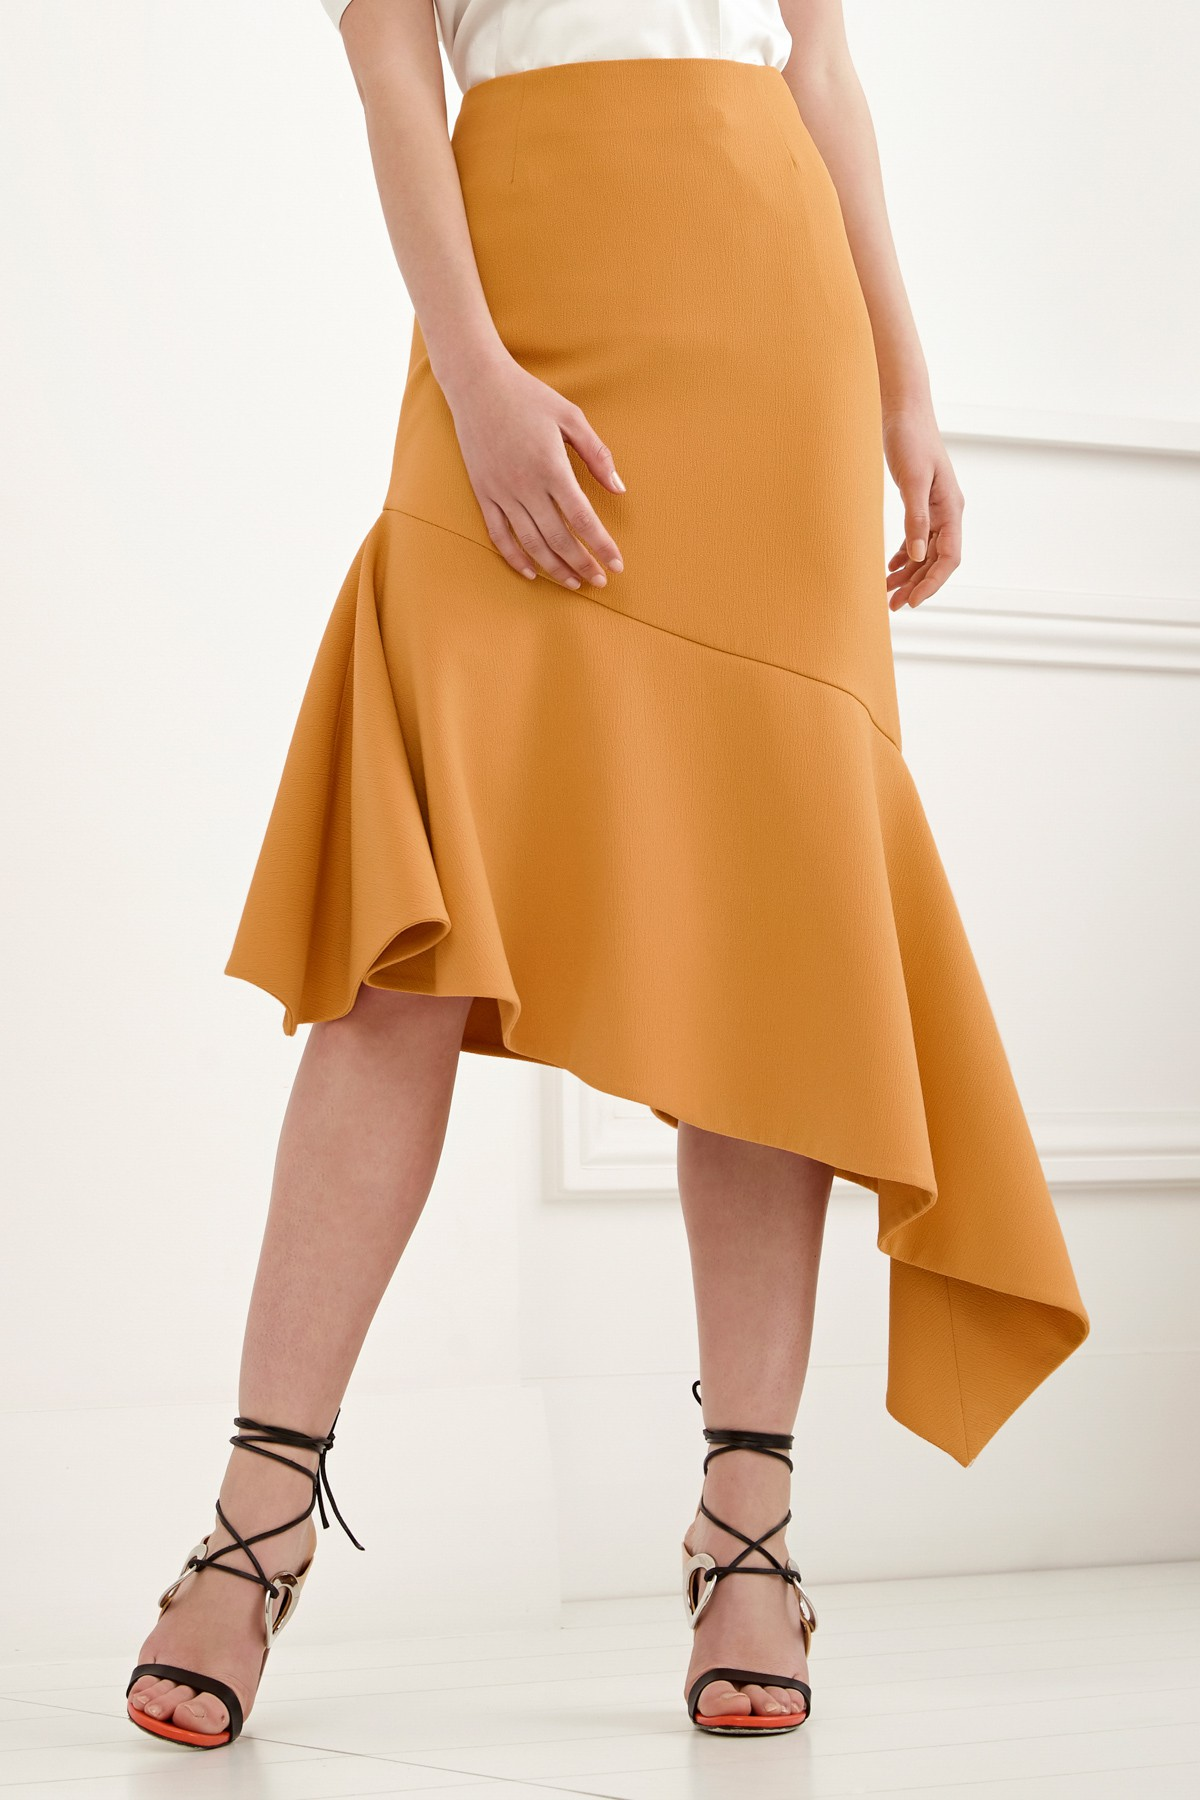 Shop C/MEO Element Skirt.